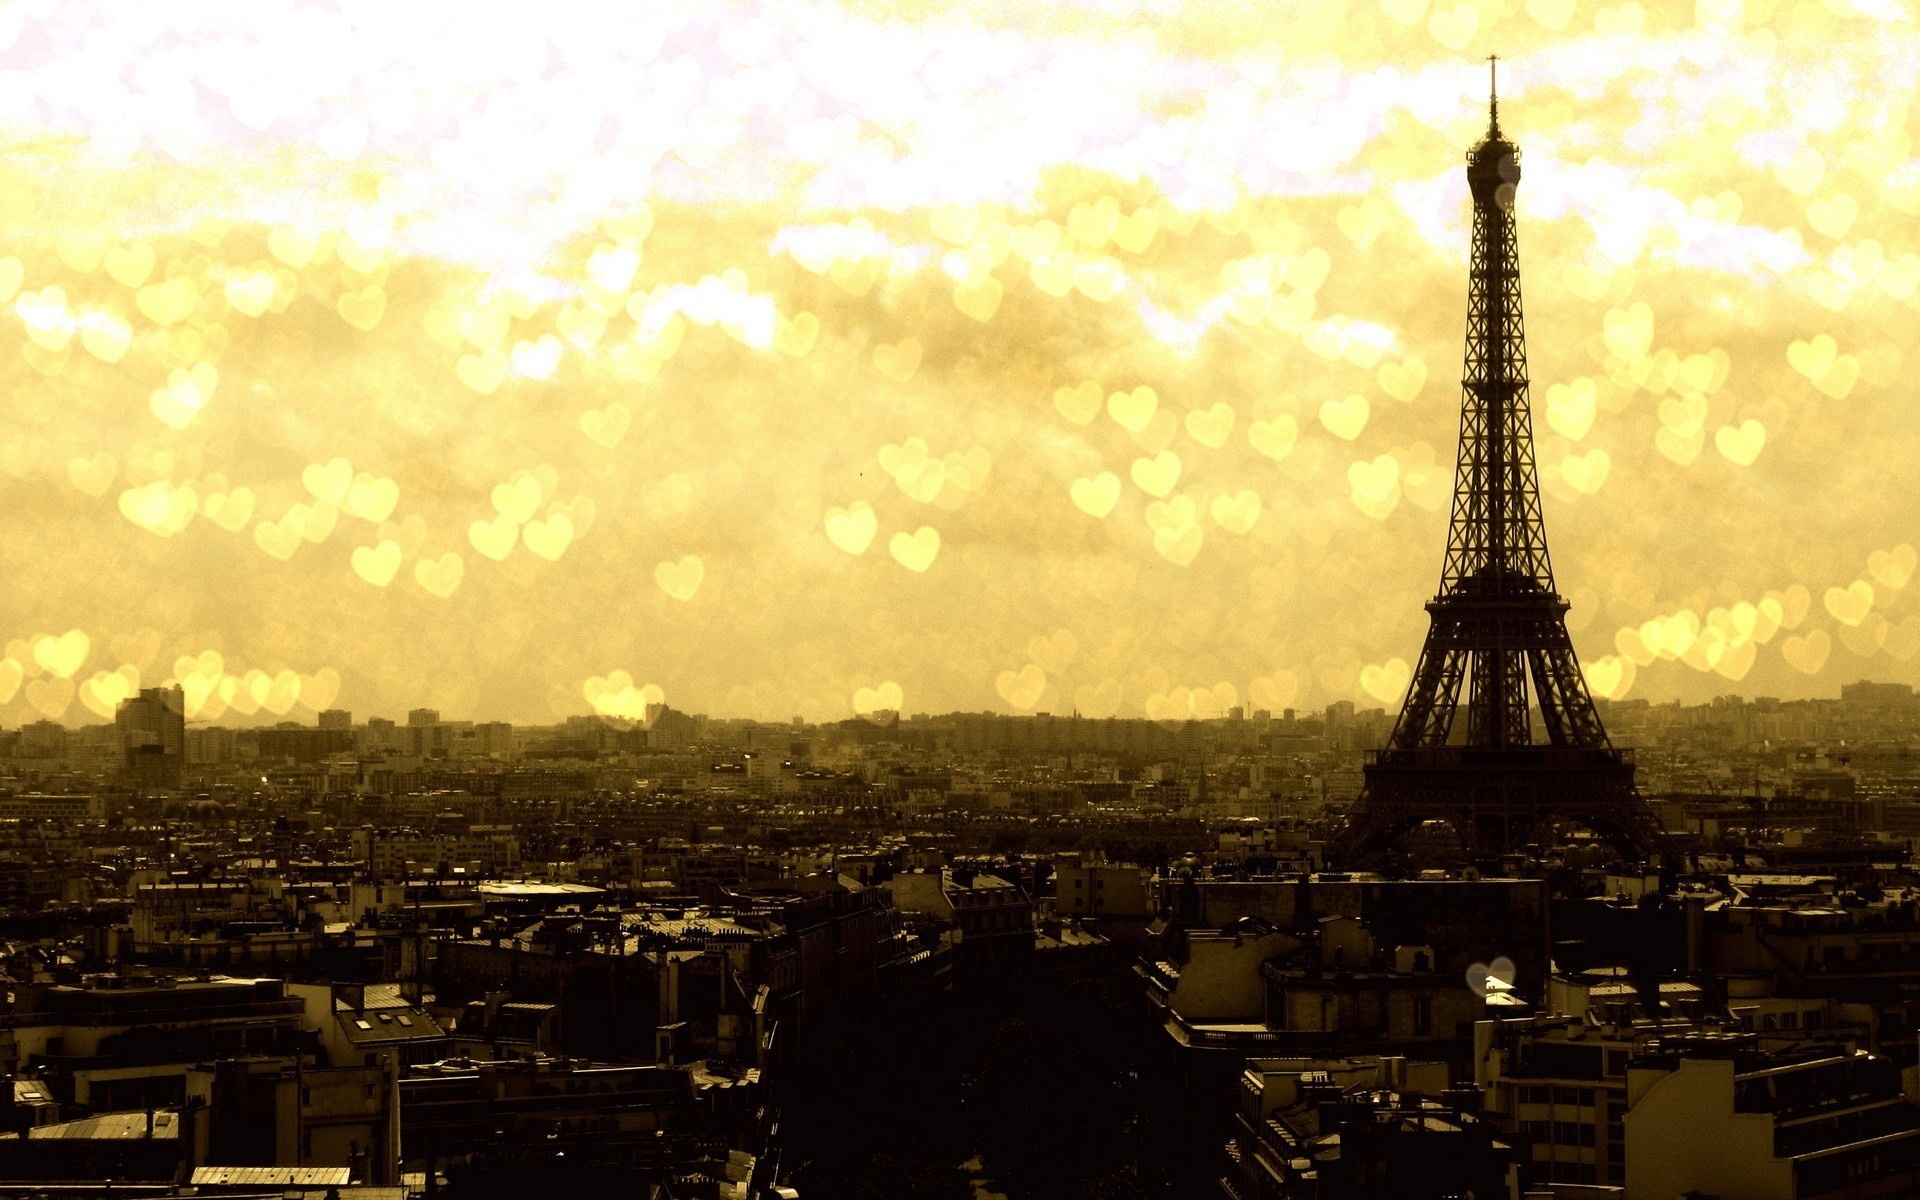 Paris Wallpapers For Desktop (18 Wallpapers)